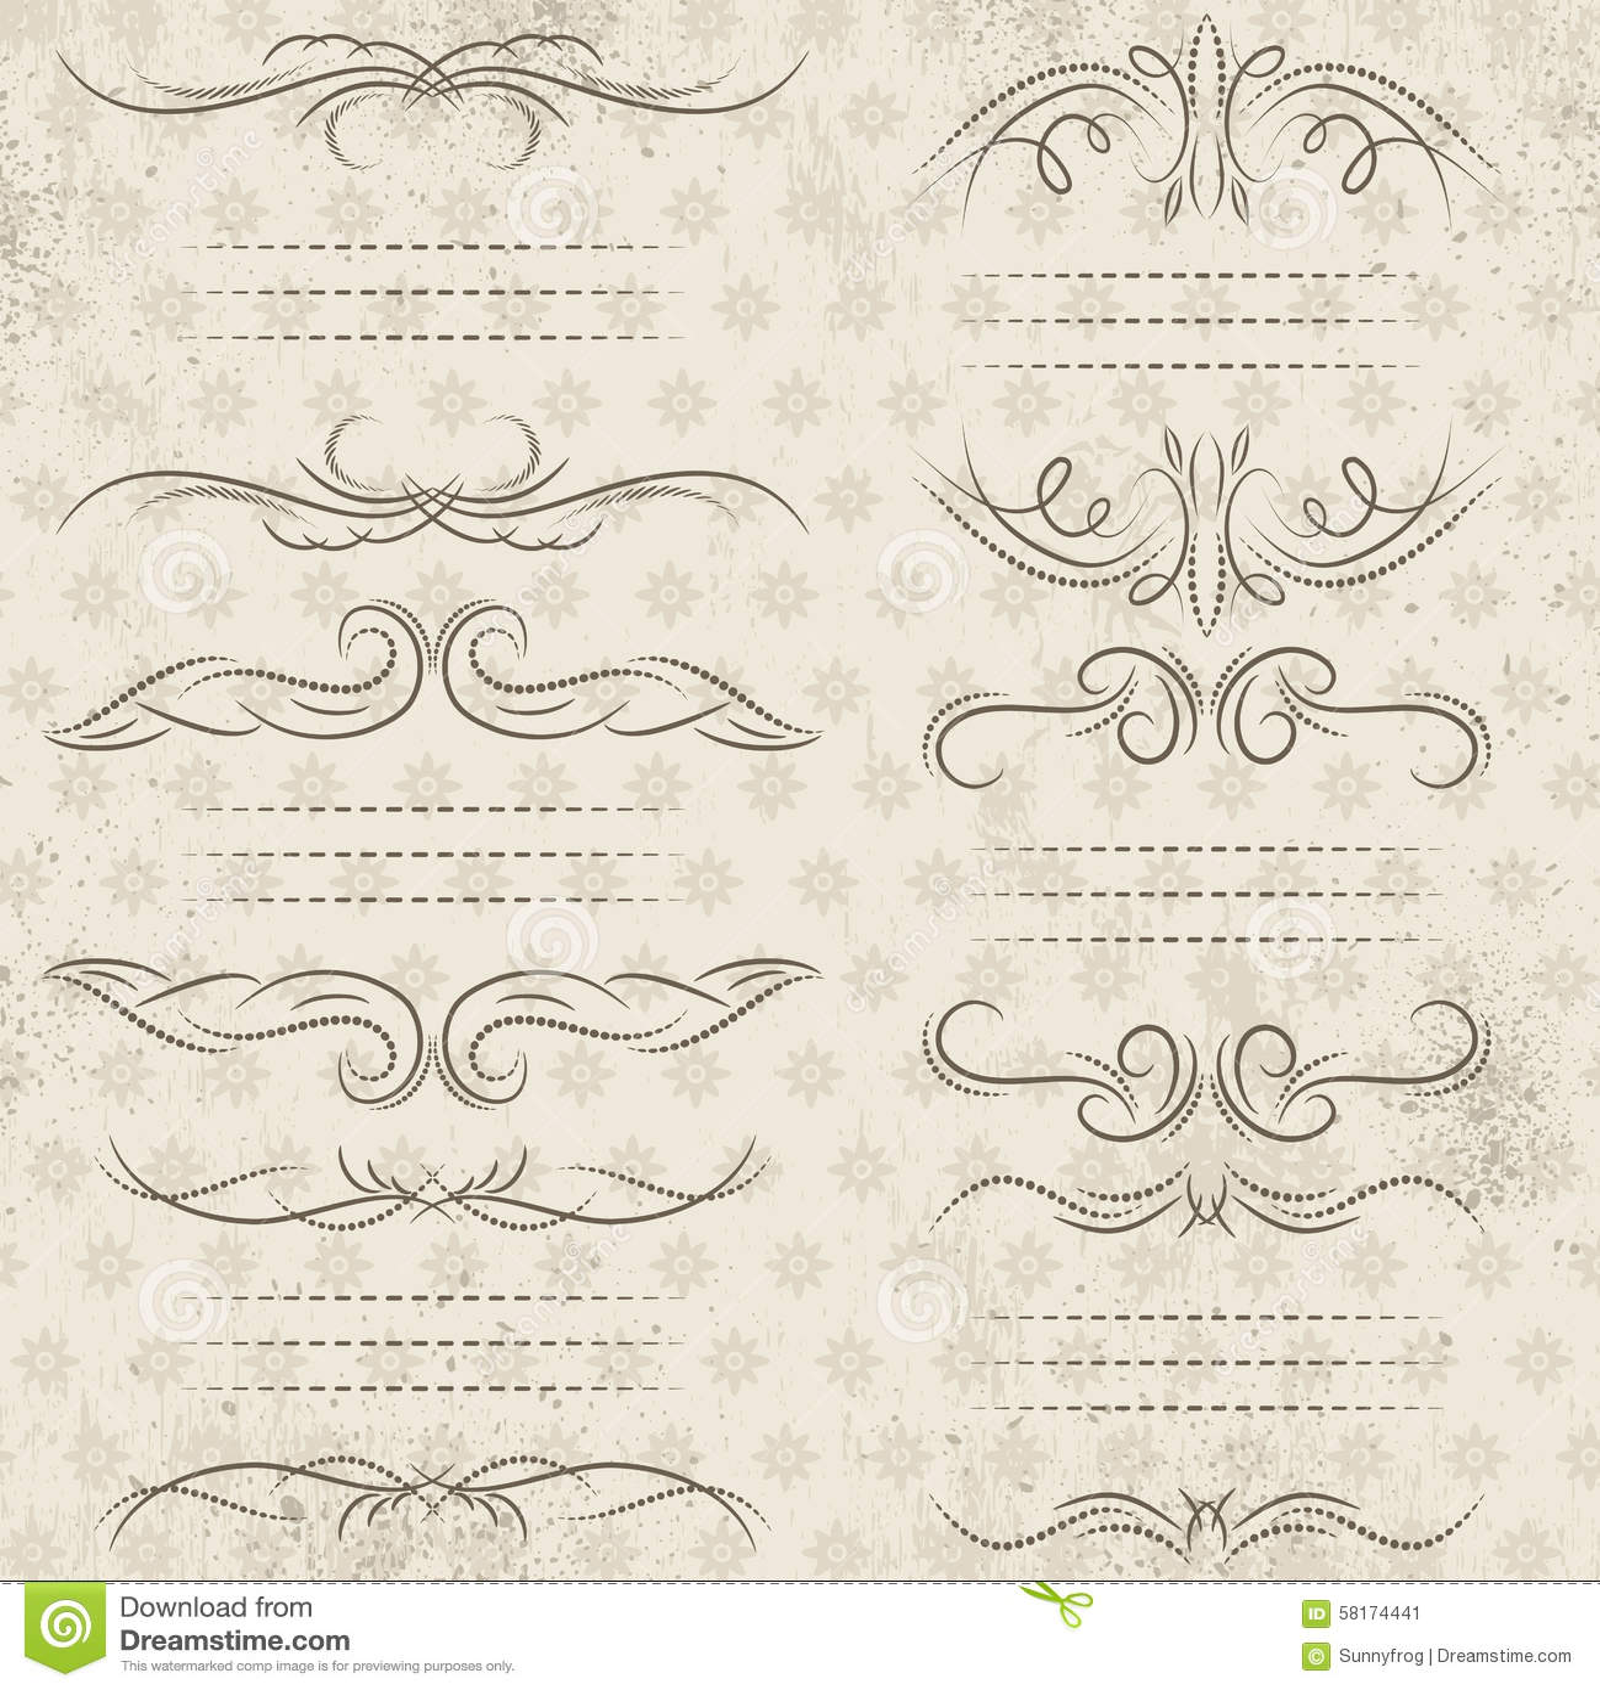 Calligraphy decorative borders ornamental rules dividers